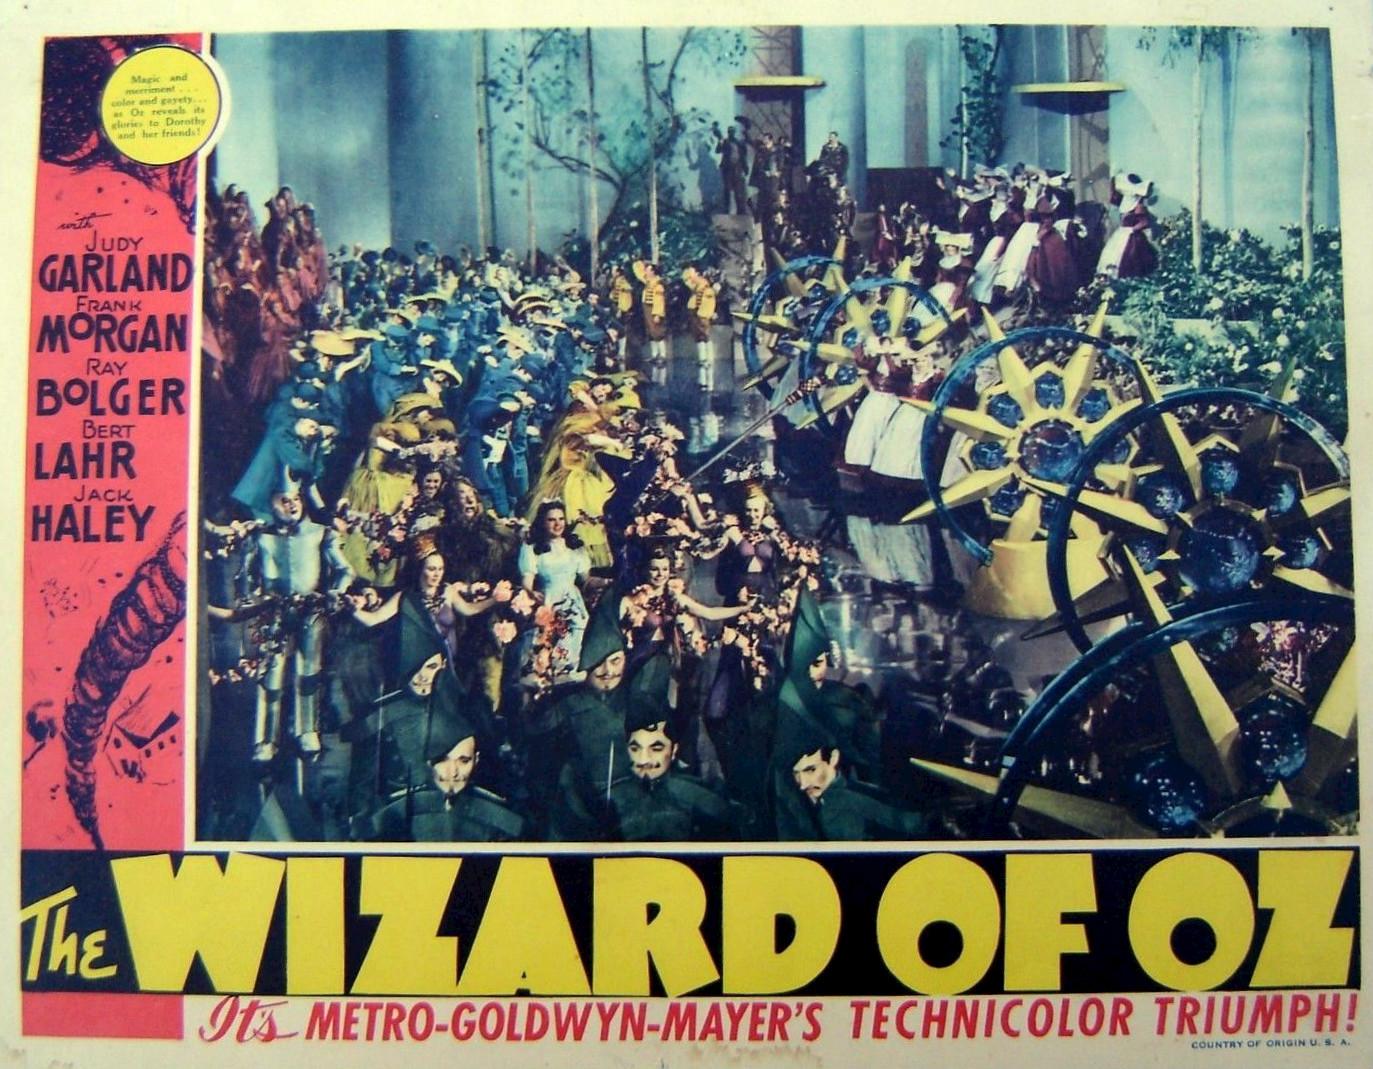 The Wizard of Oz (1939 film) - Wikipedia